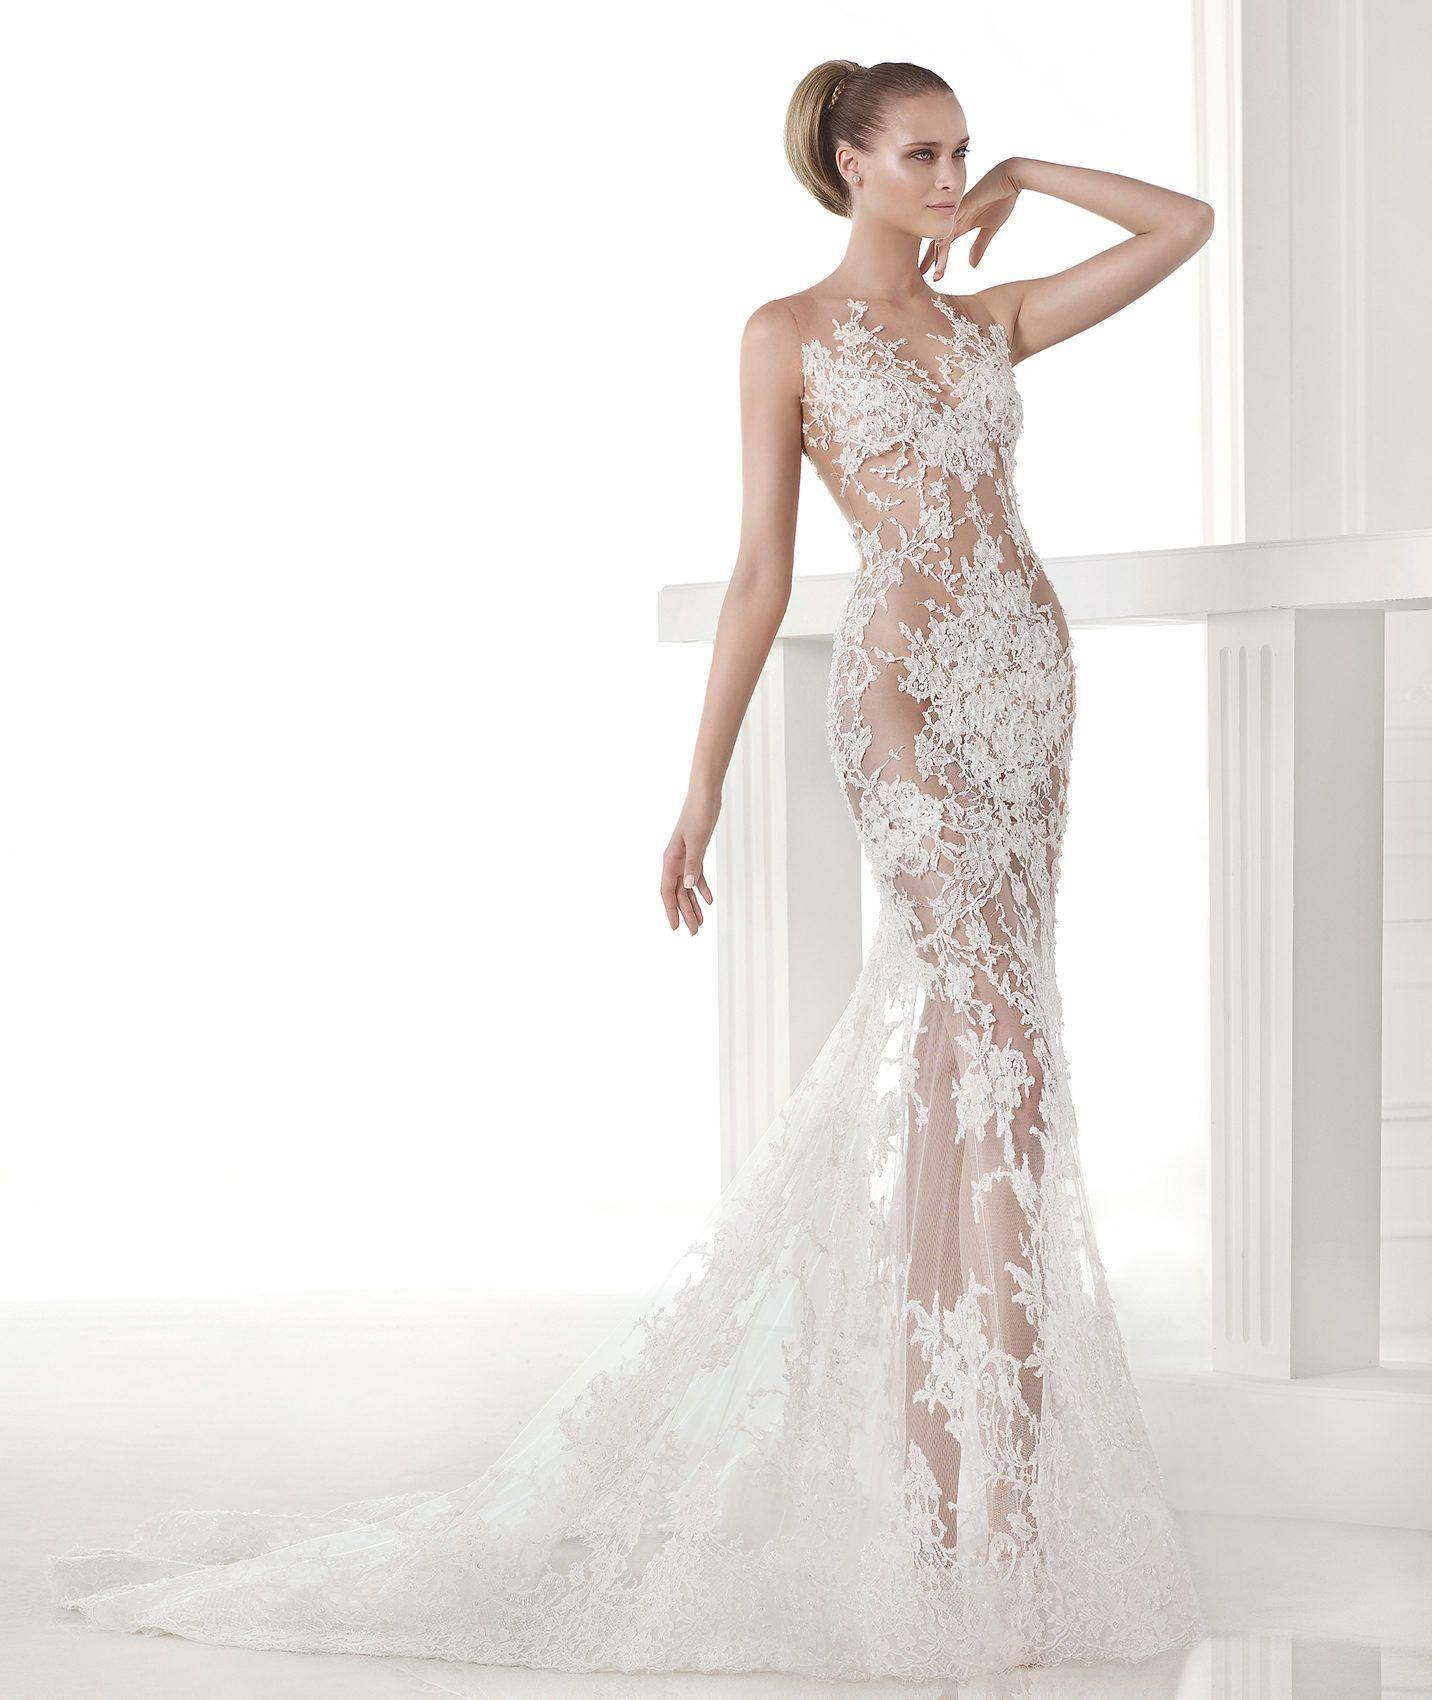 modele robe mariage 2015 - Tati Mariage 2015